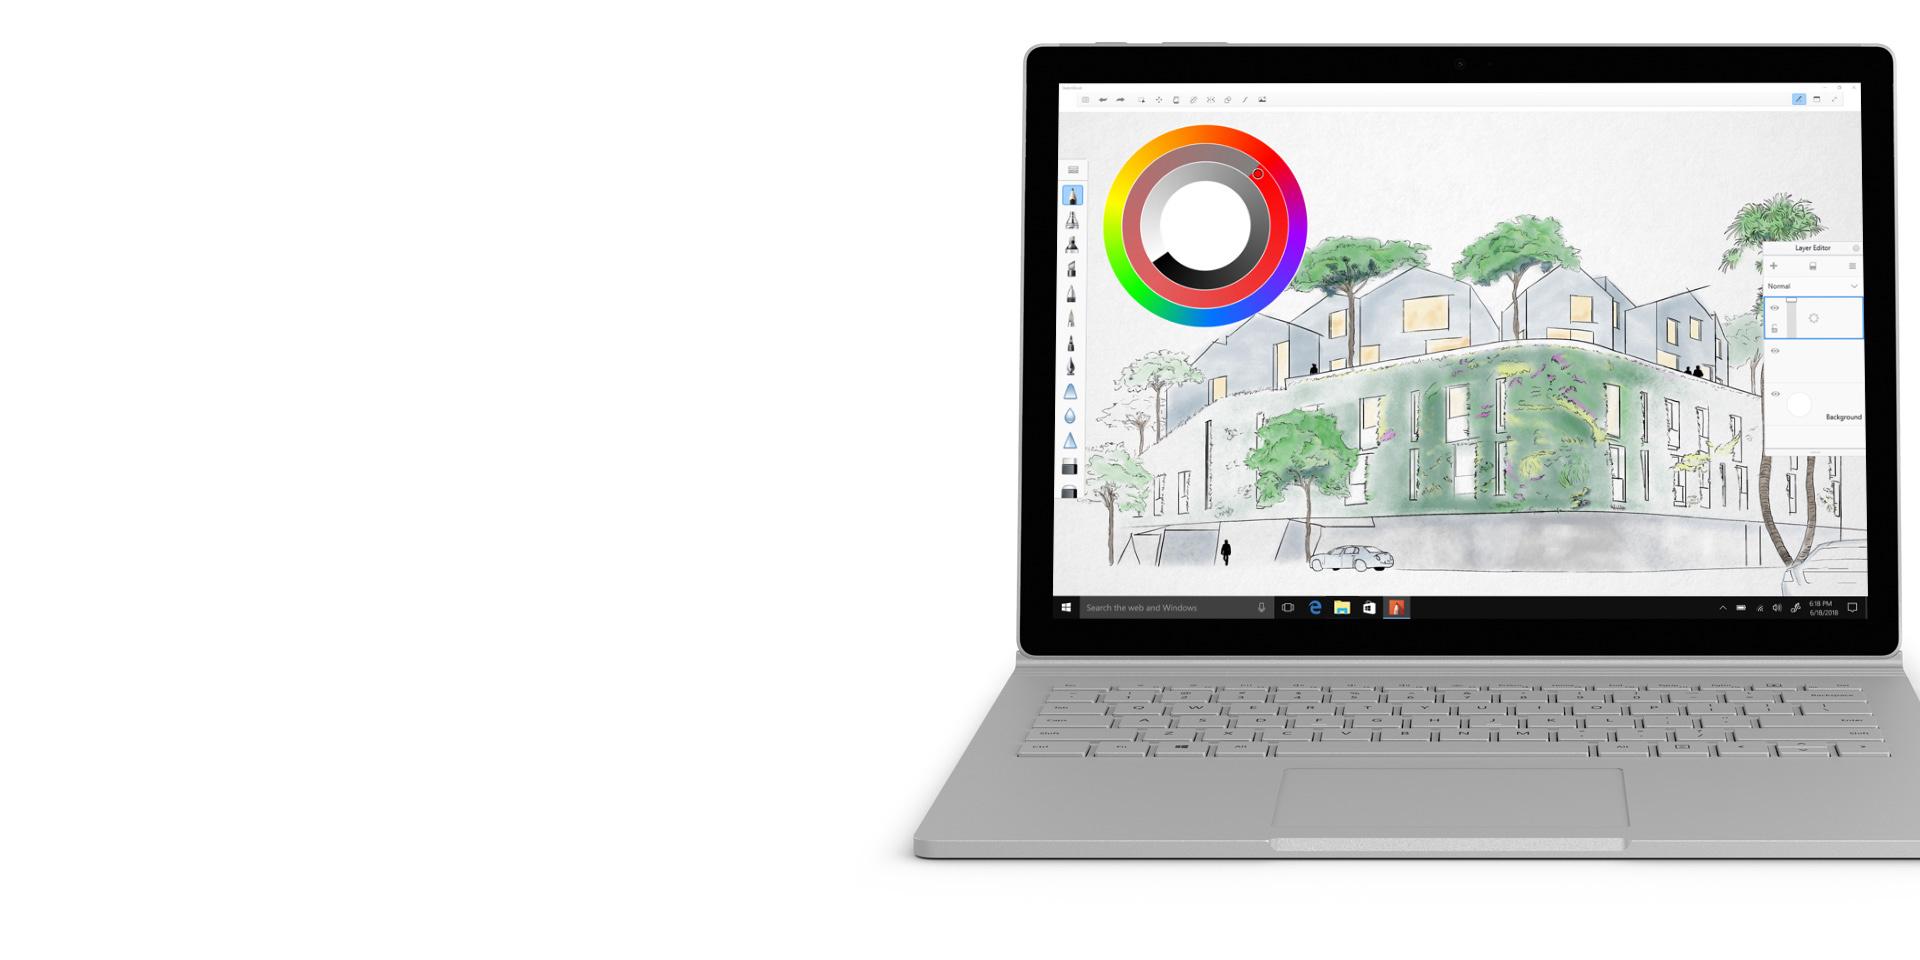 Autodesk SketchBook sullo schermo di un dispositivo Surface Book 2